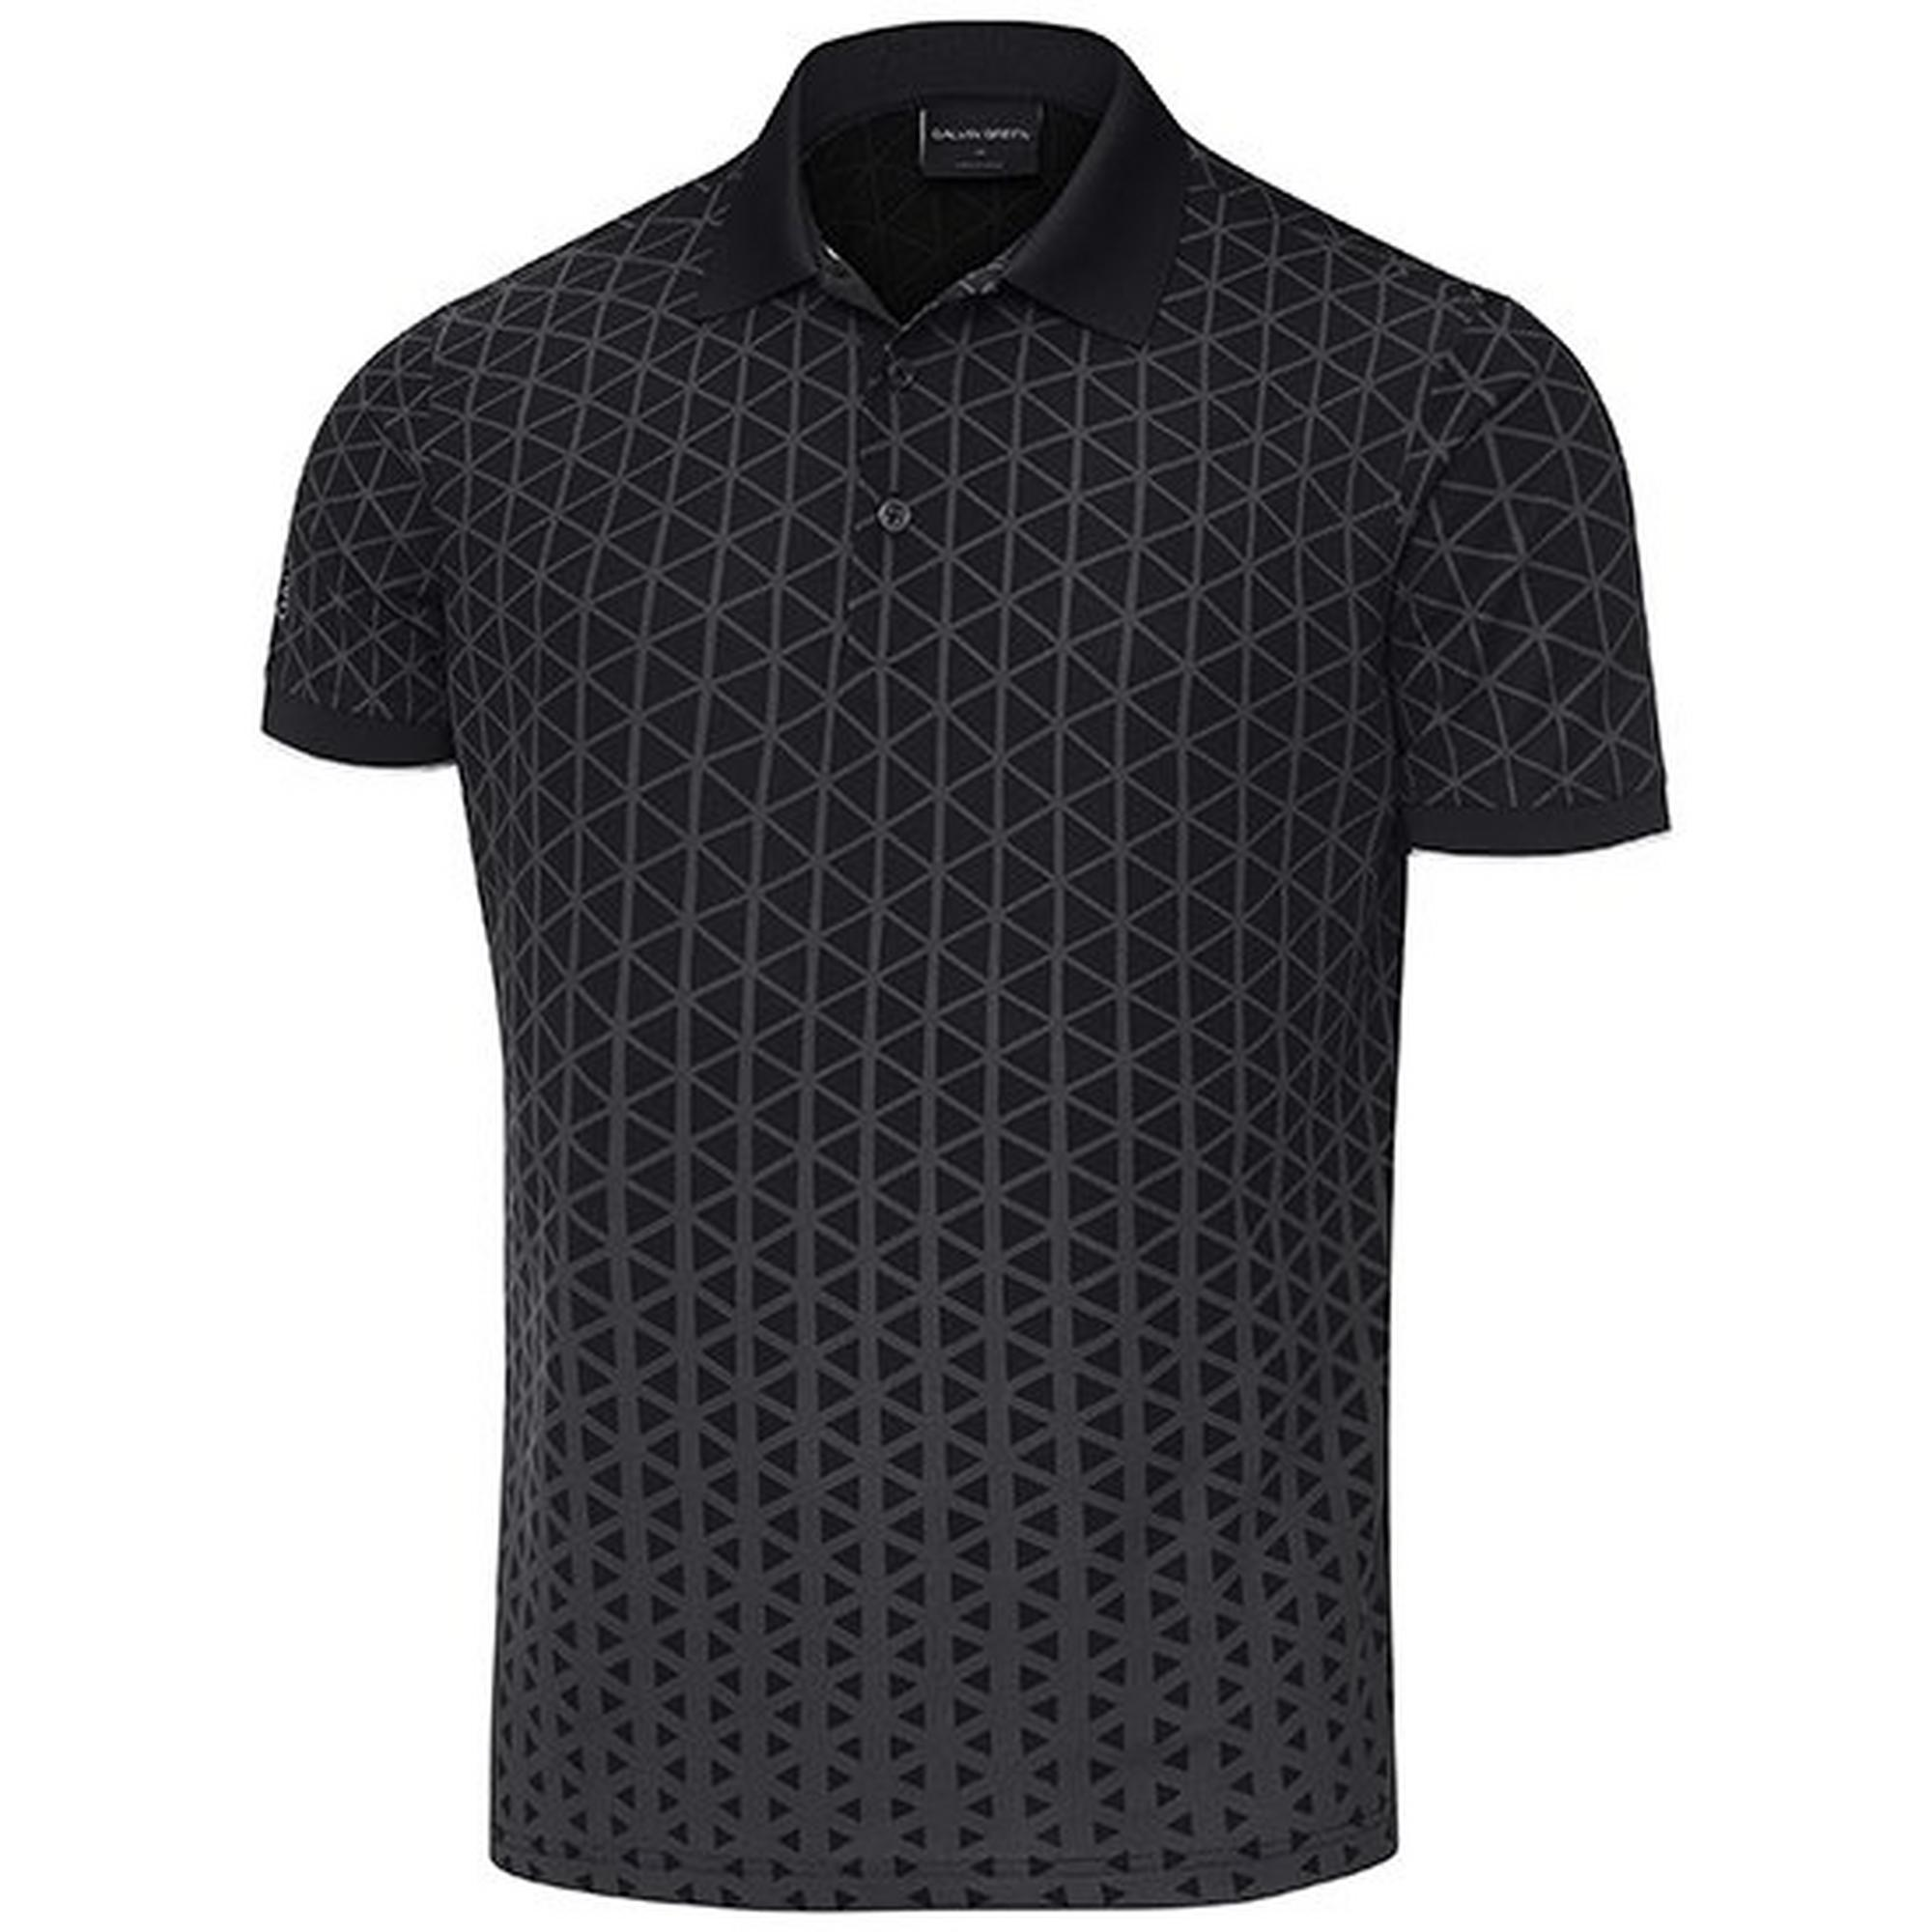 Men's Matt VENTIL8 PLUS Short Sleeve Shirt